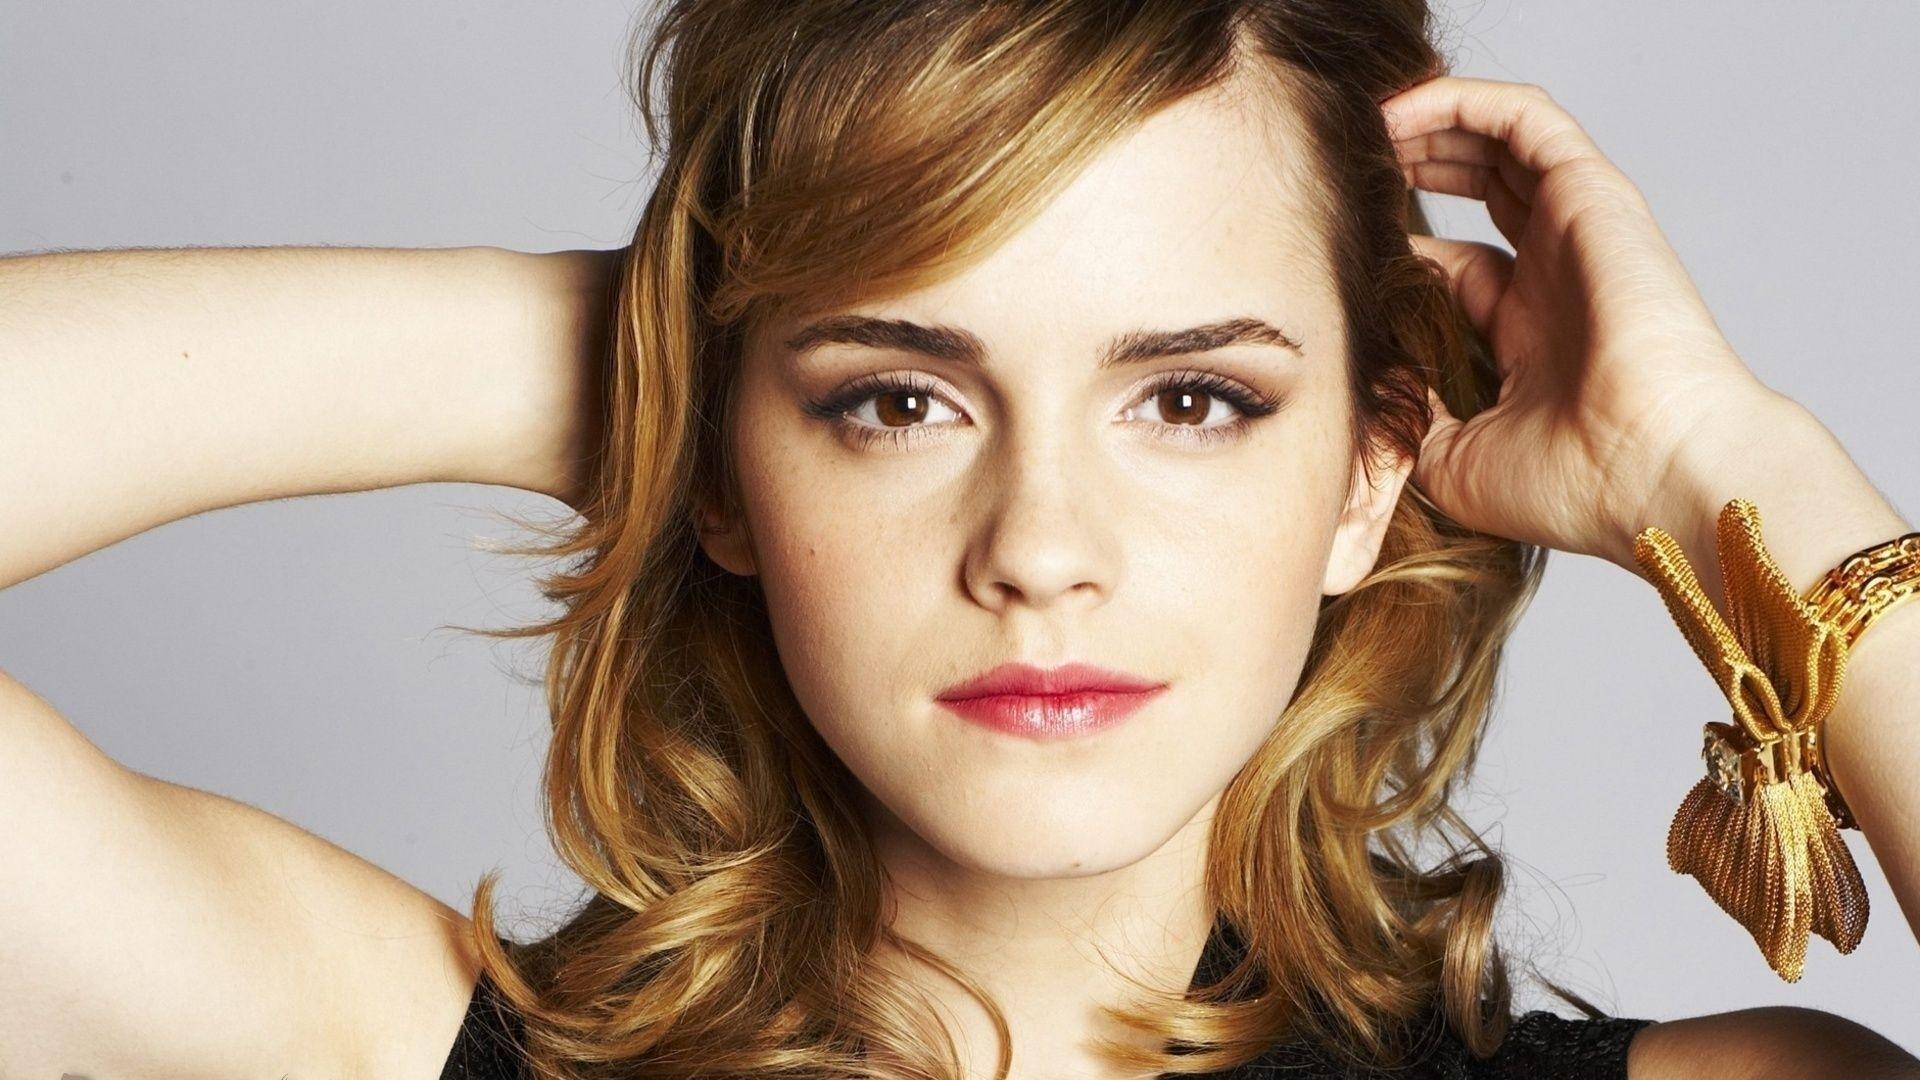 … Emma Watson Wallpaper …